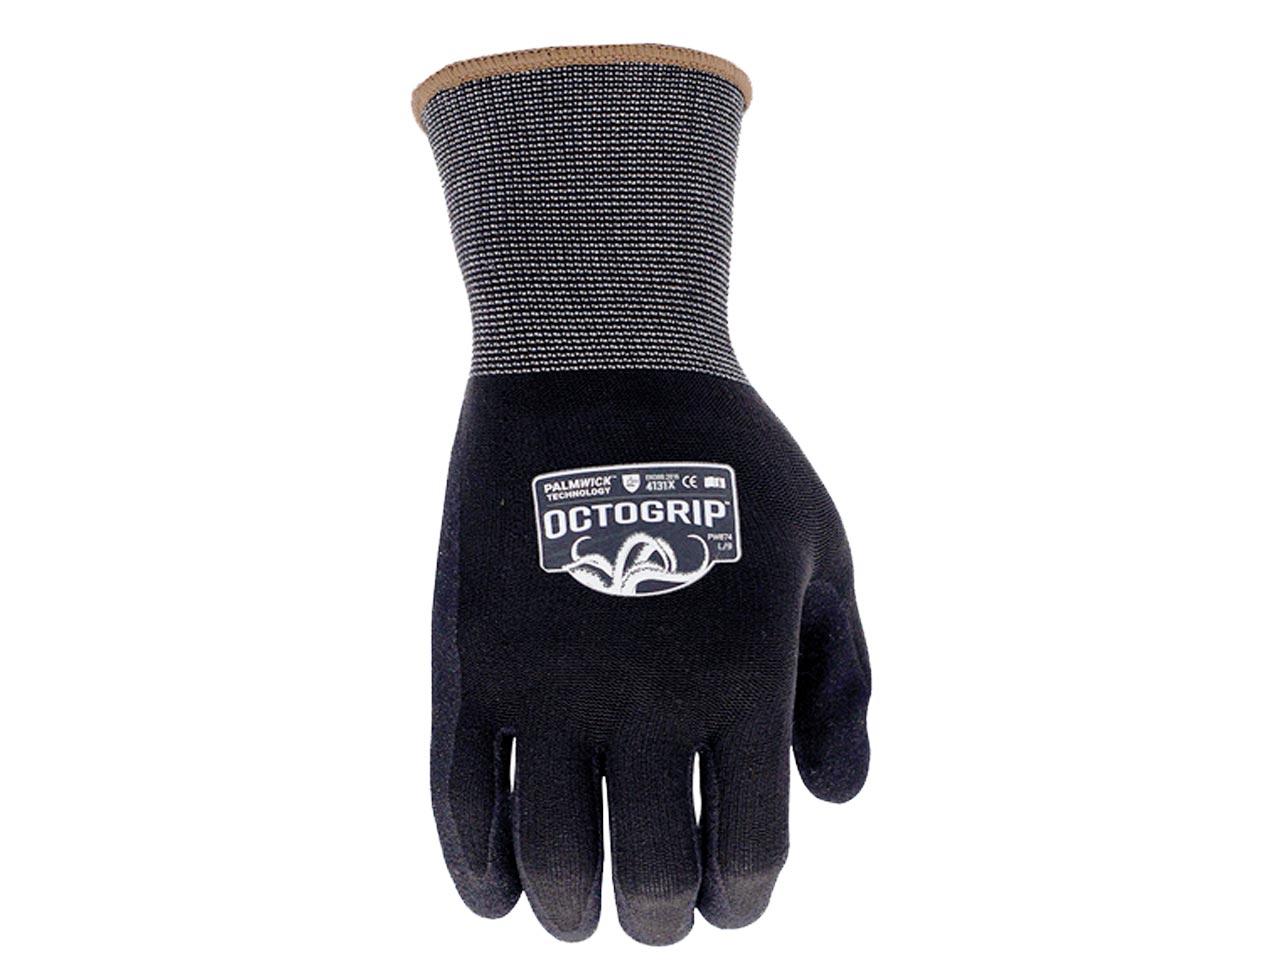 15g High Performance Series Glove Size M (8)